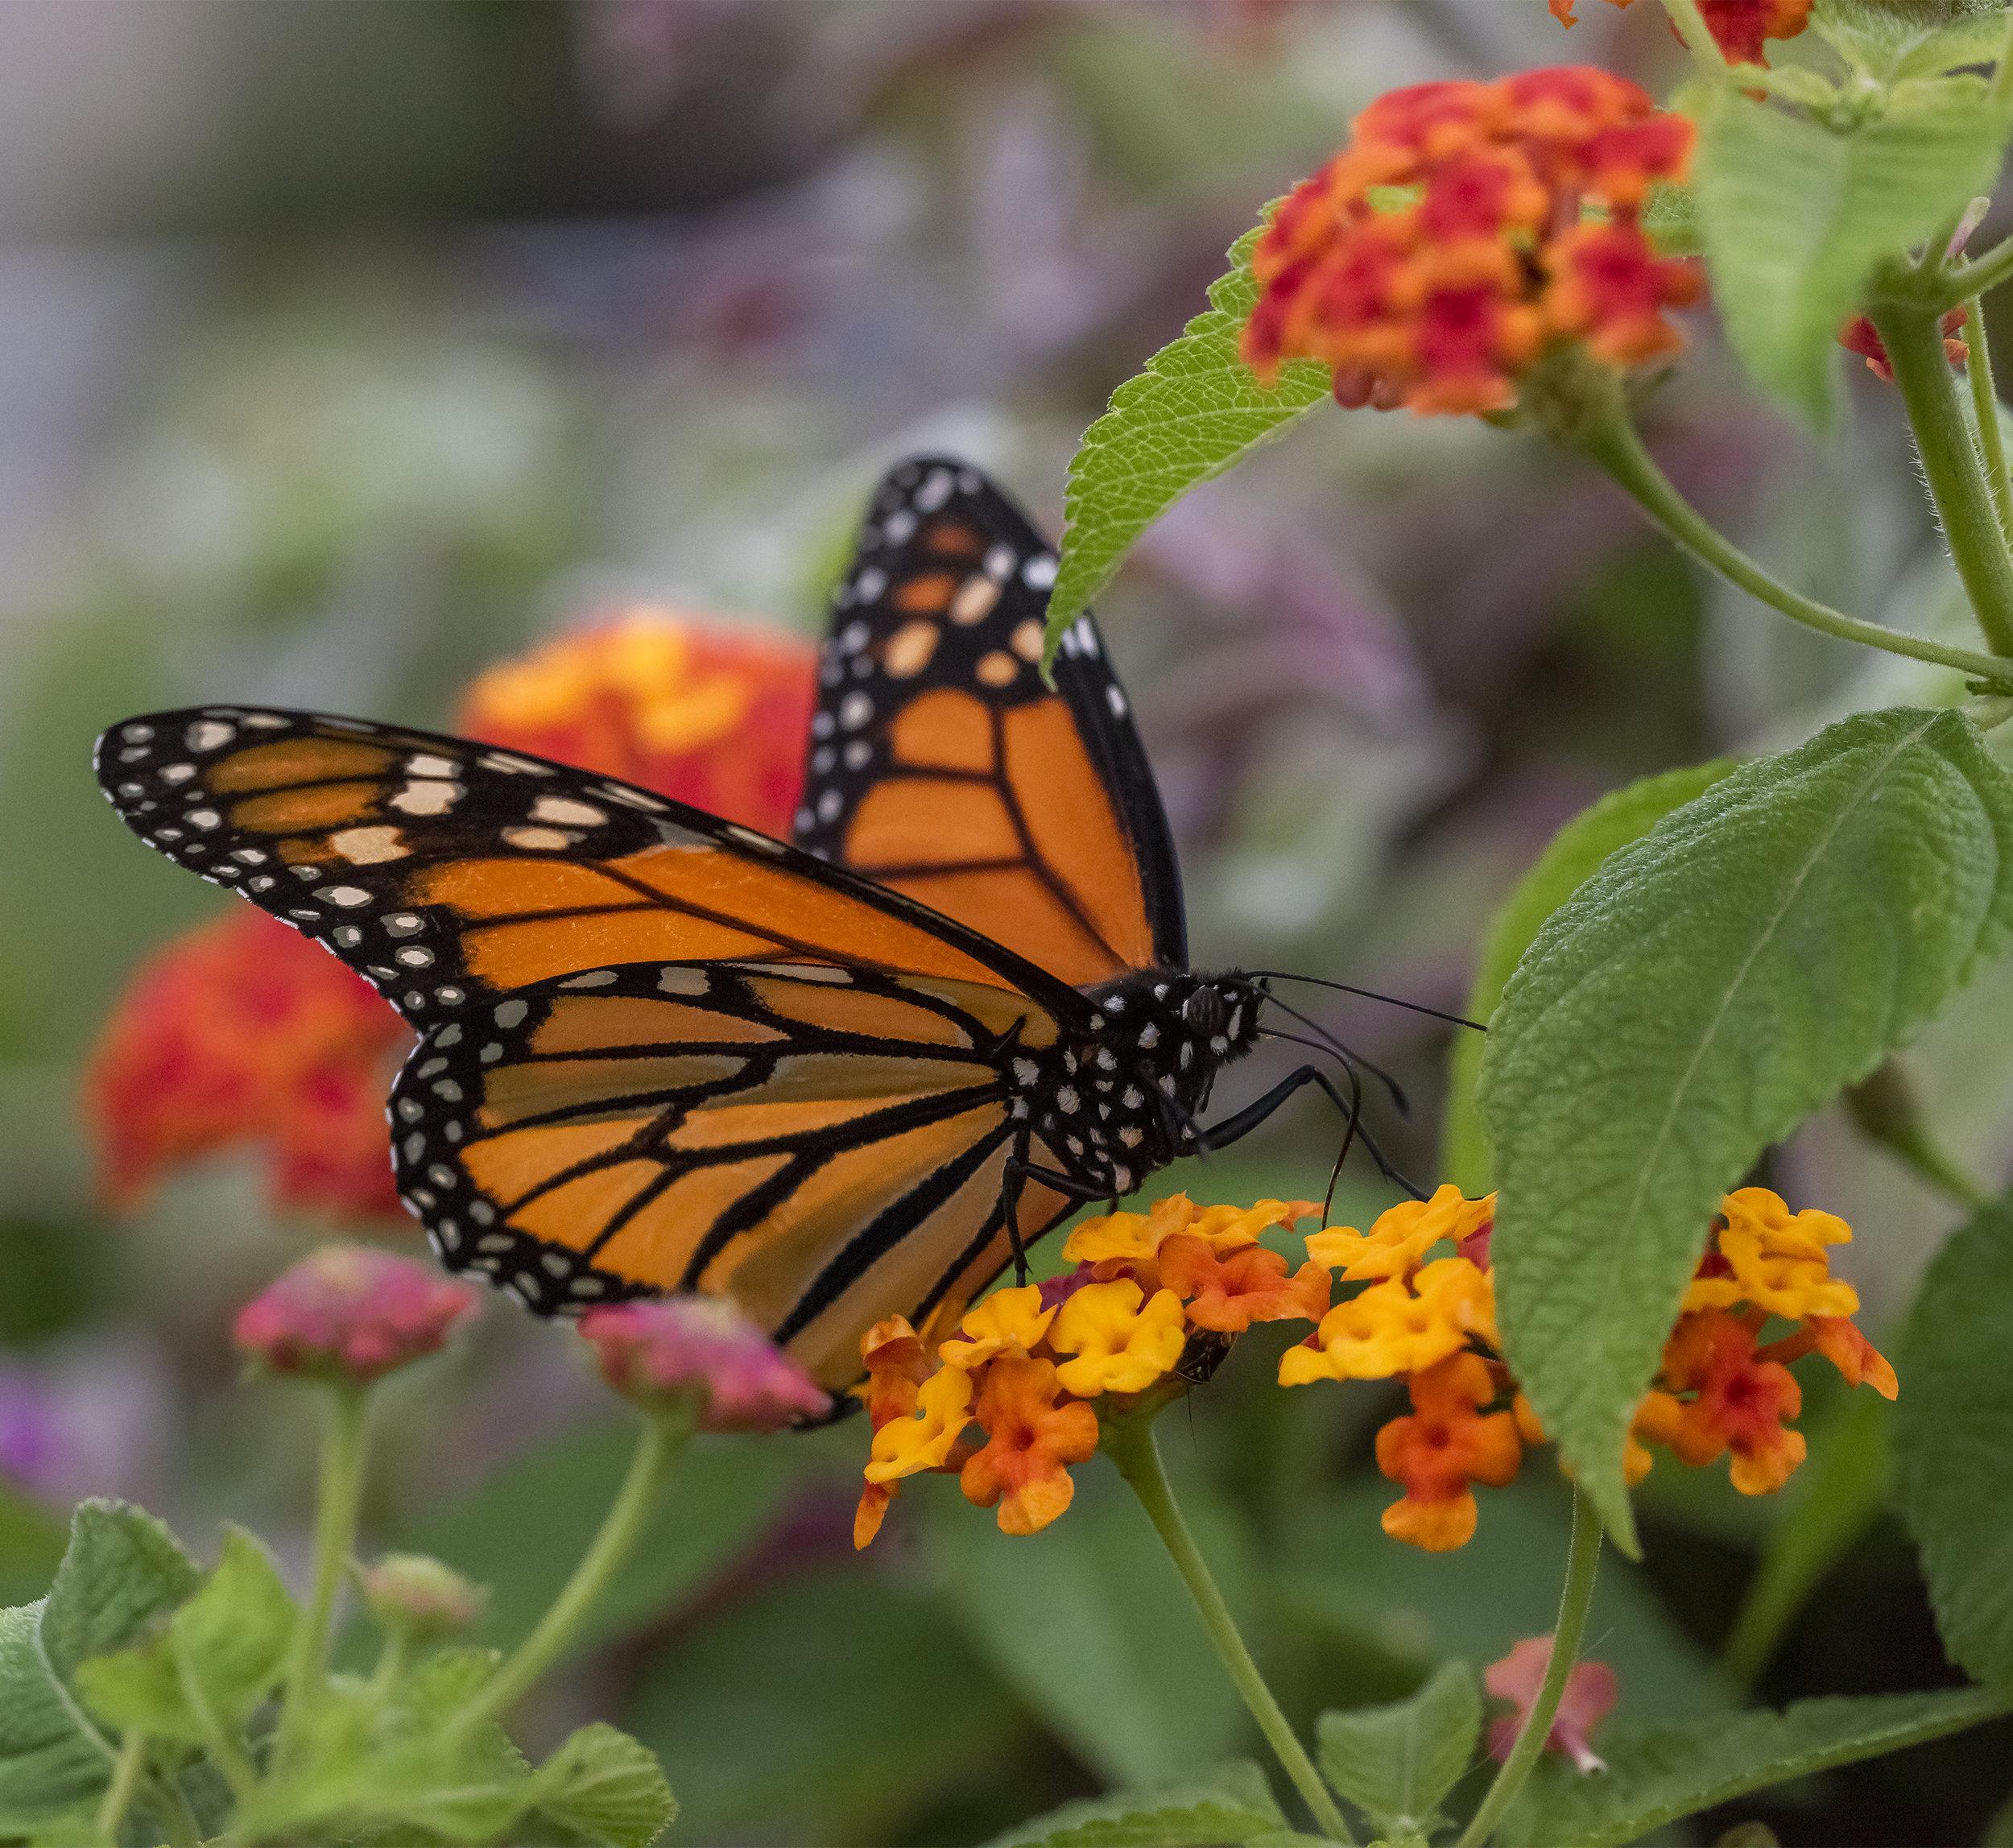 Butterfly in U. S. Botanical Garden, Washington, D. C.